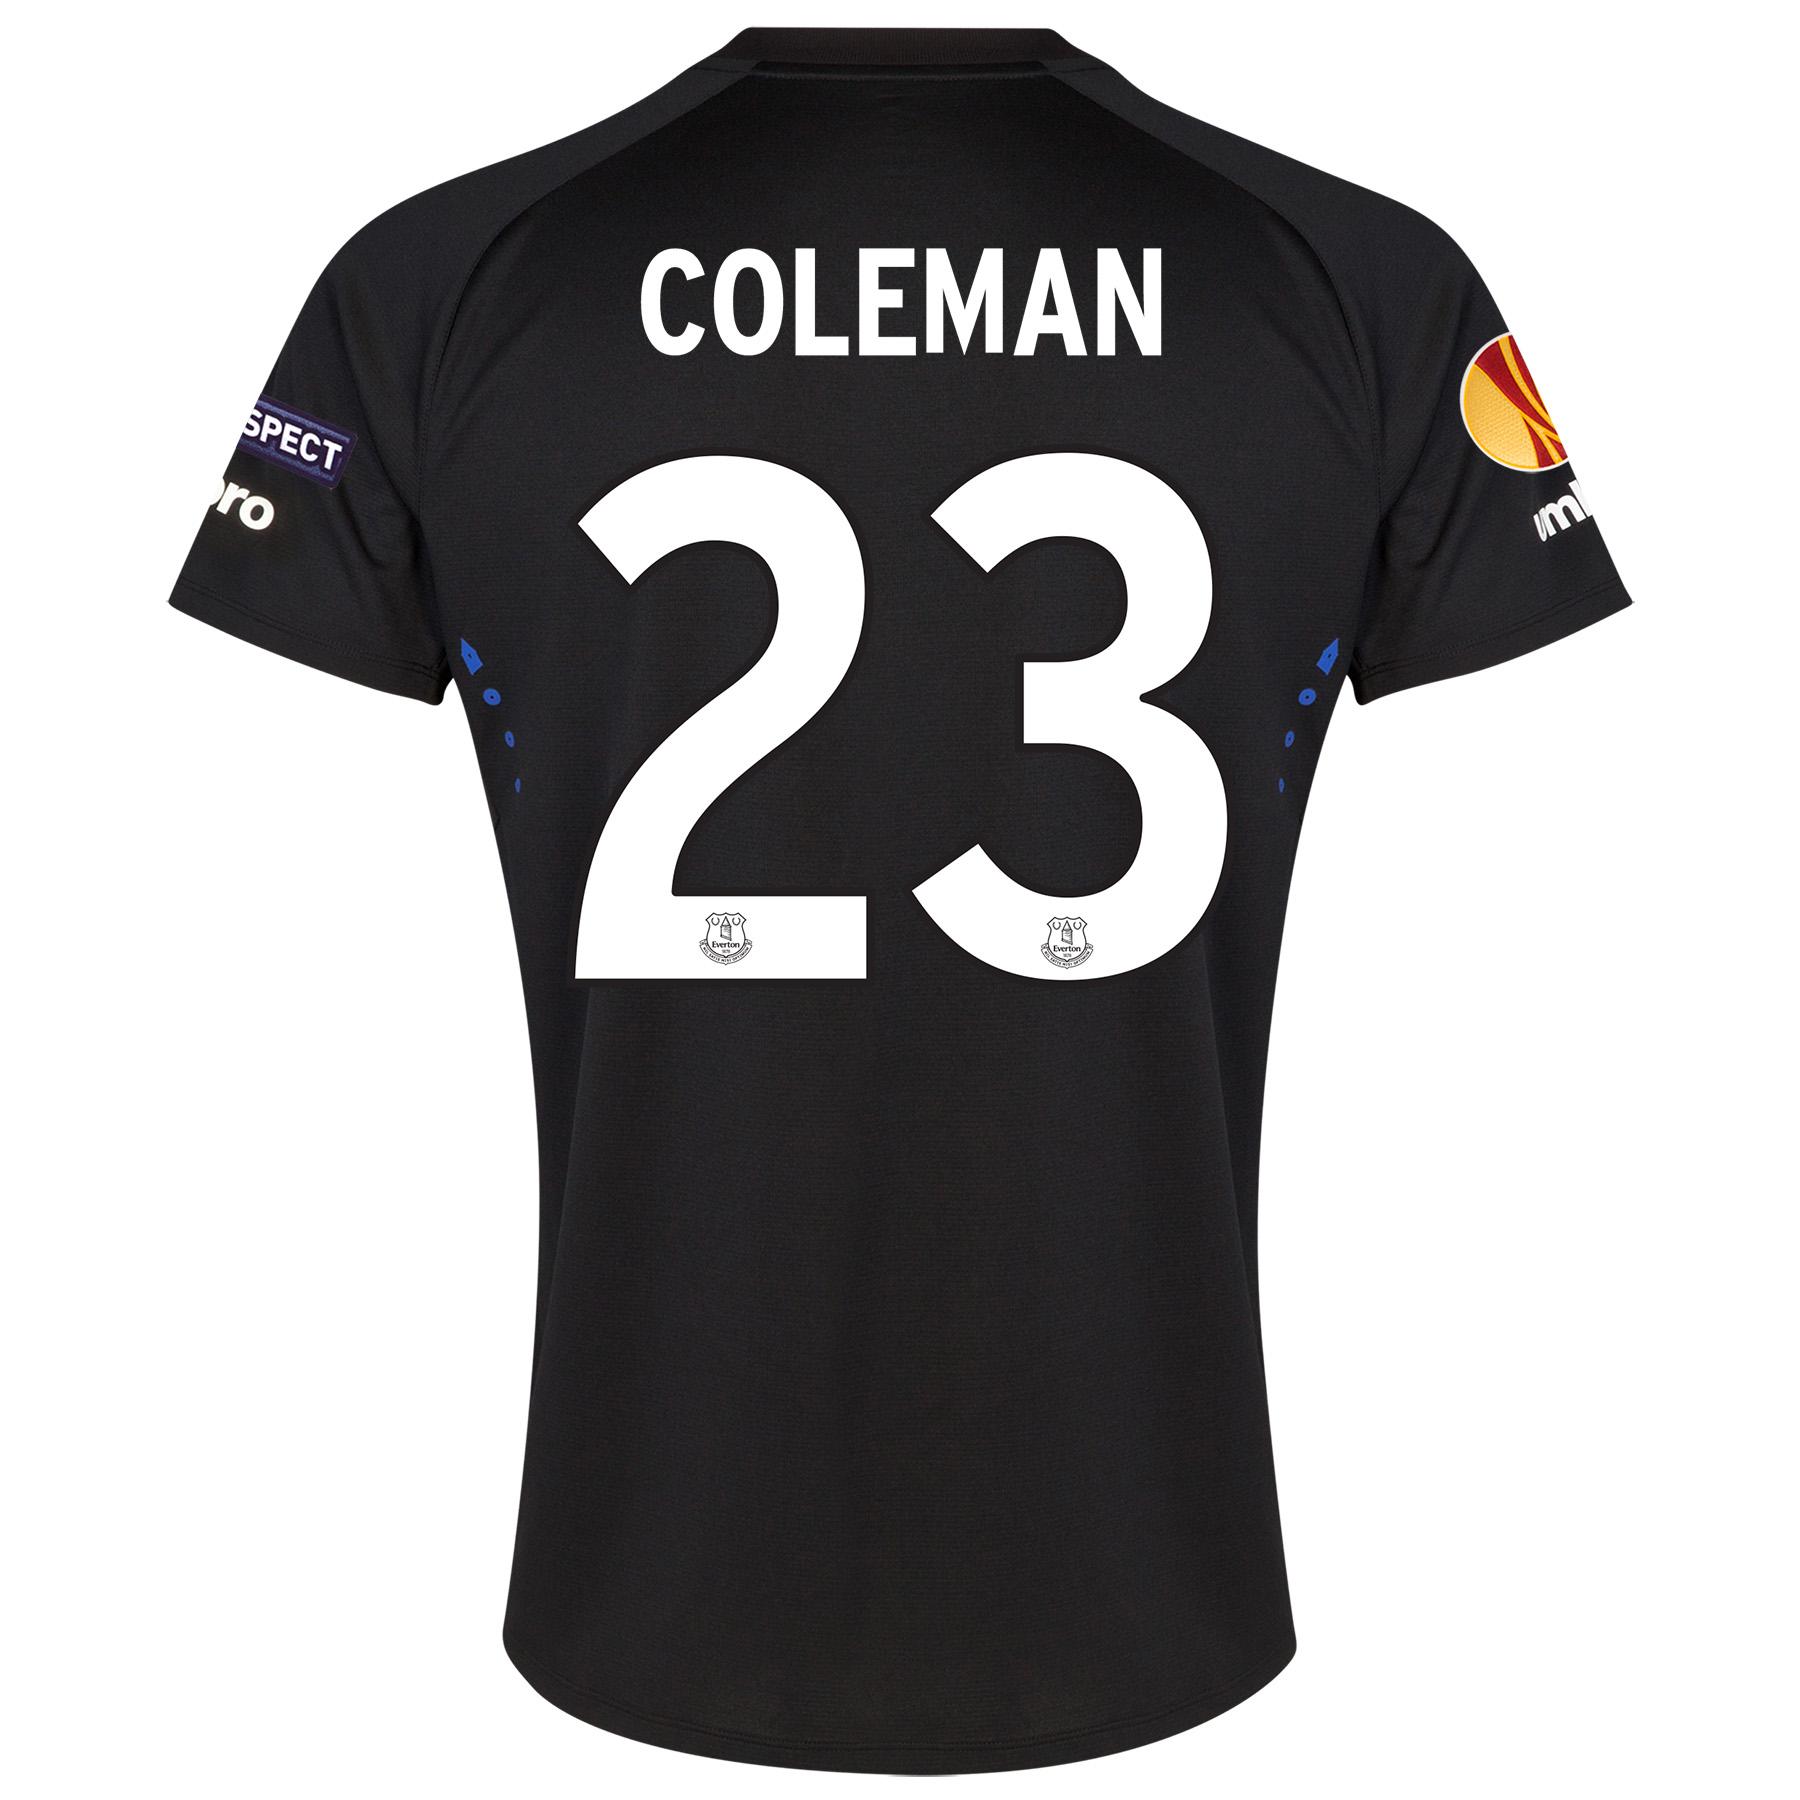 Everton UEFA Europa League Away Shirt 2014/15 with Coleman 23 printing